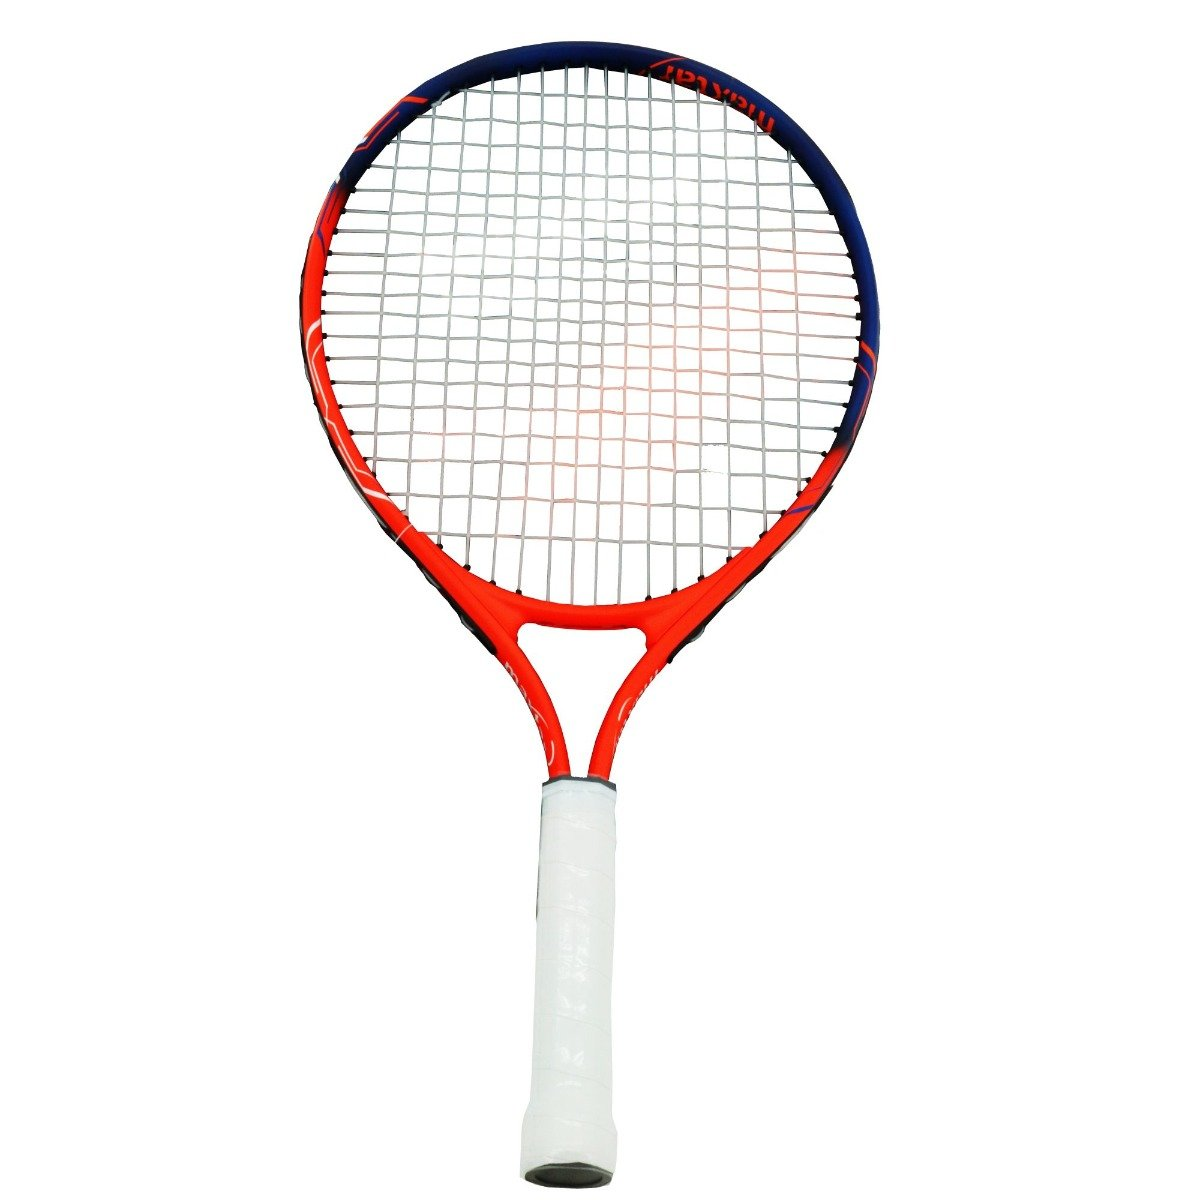 Racheta de tenis pentru copii Maxtar